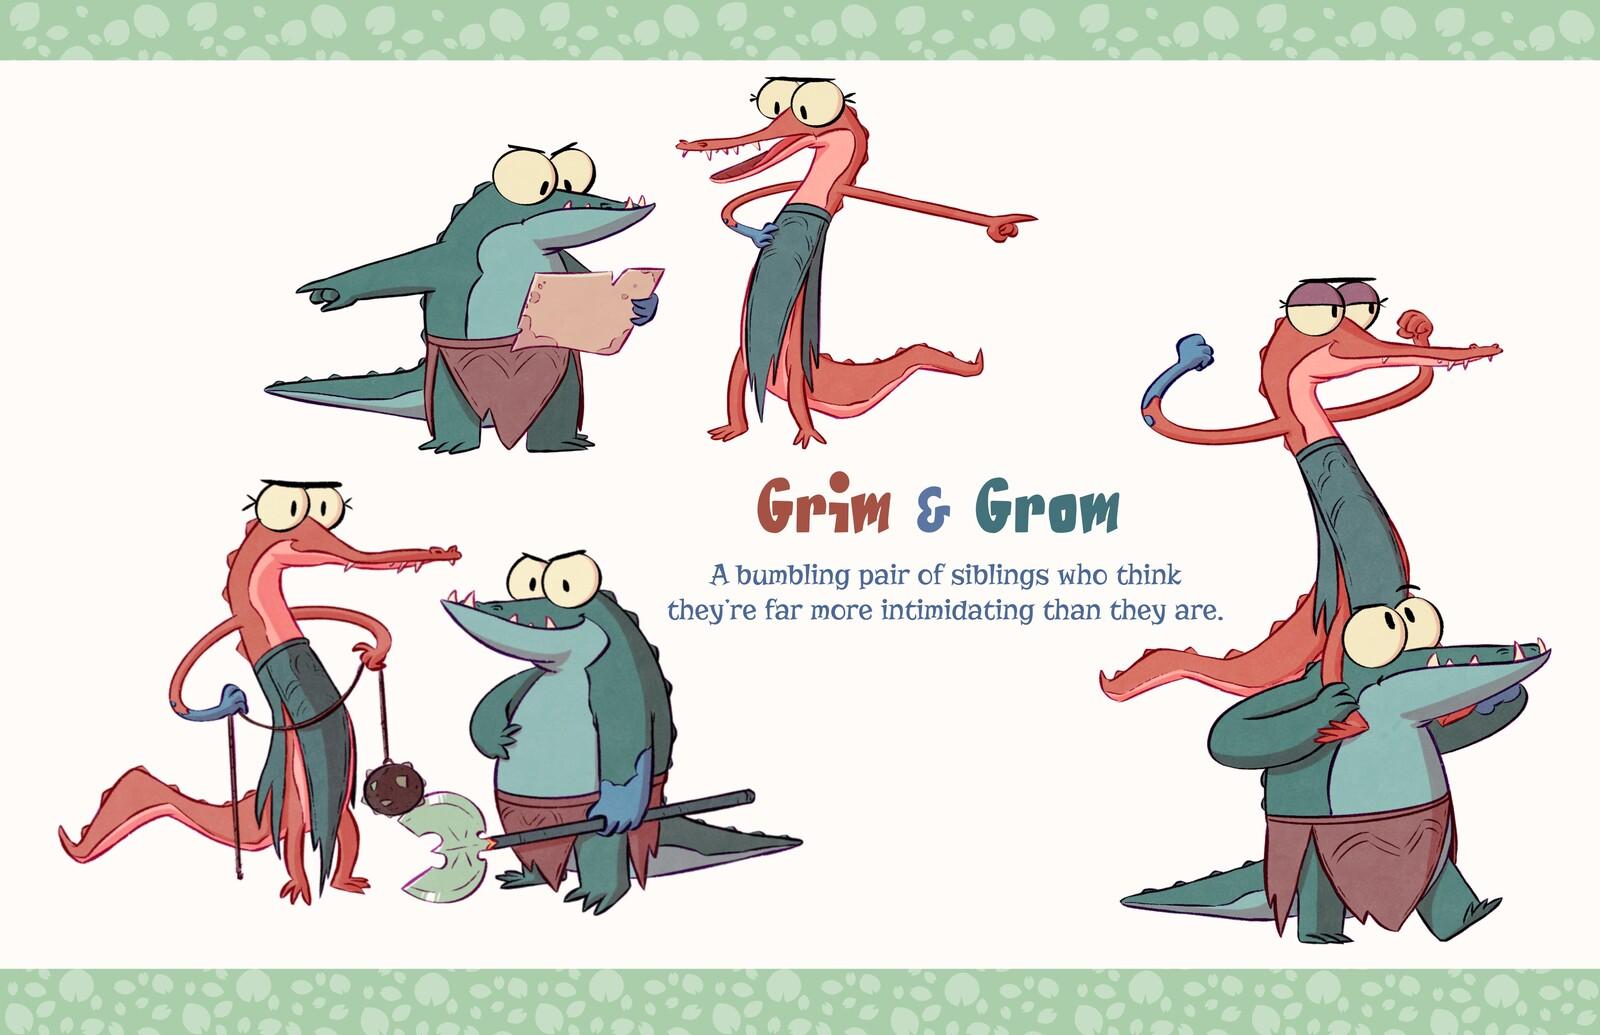 Wade's Glade - Grim&Grom